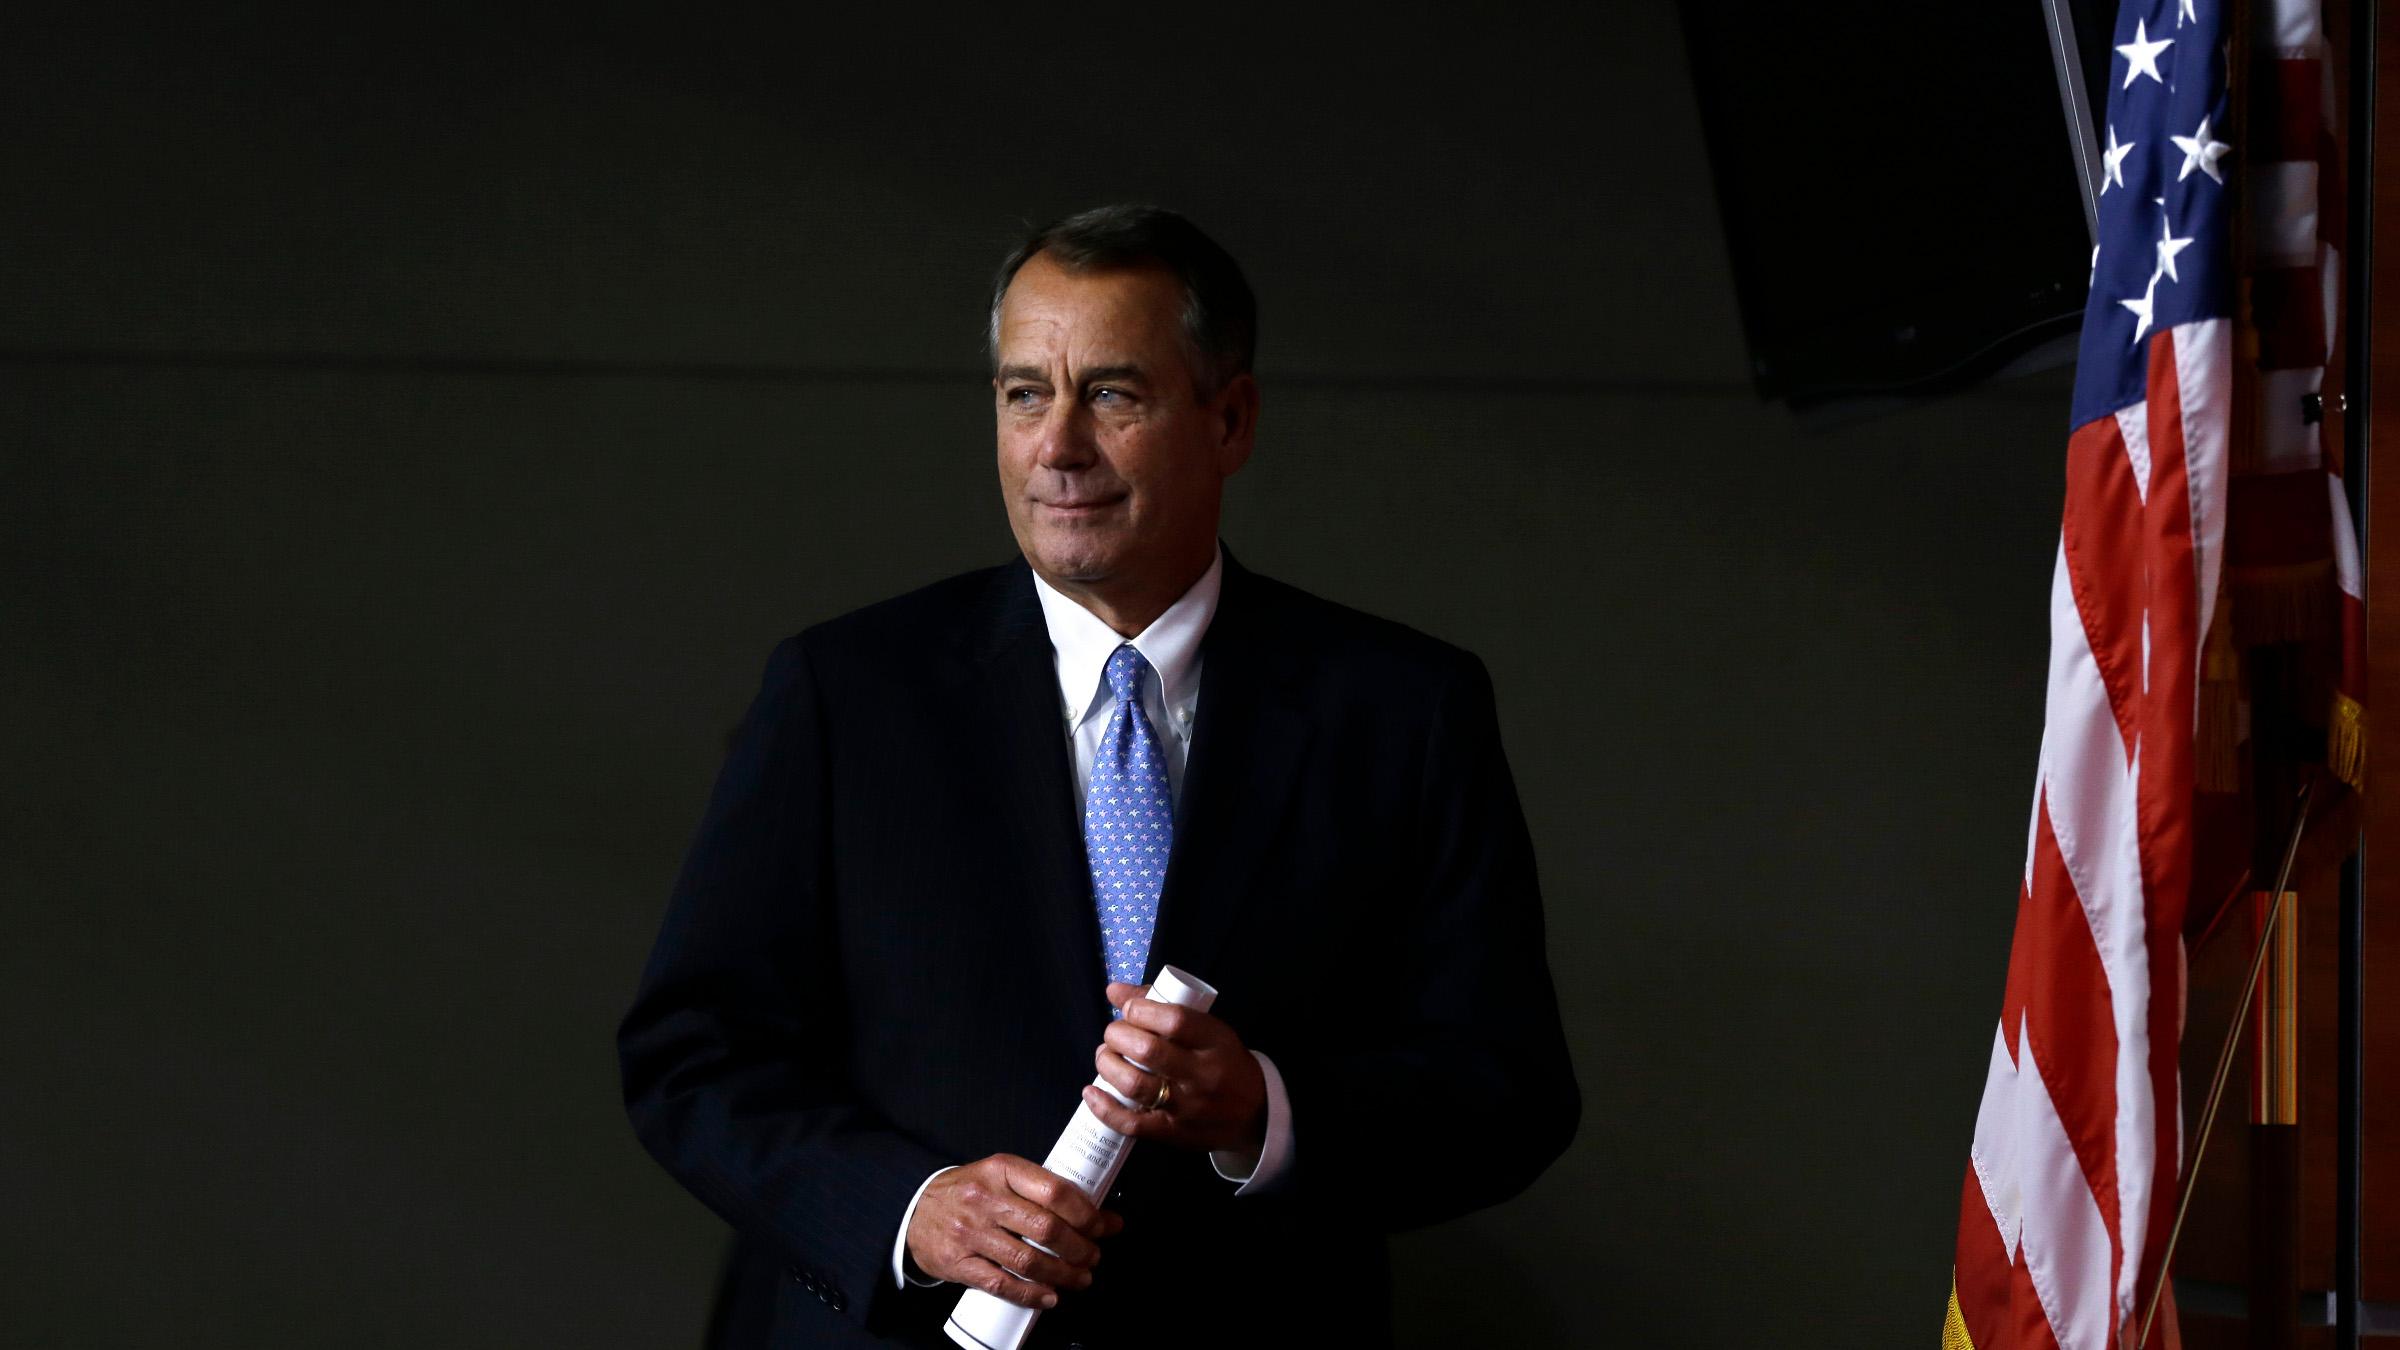 What now? House Speaker John Boehner is running out of options.